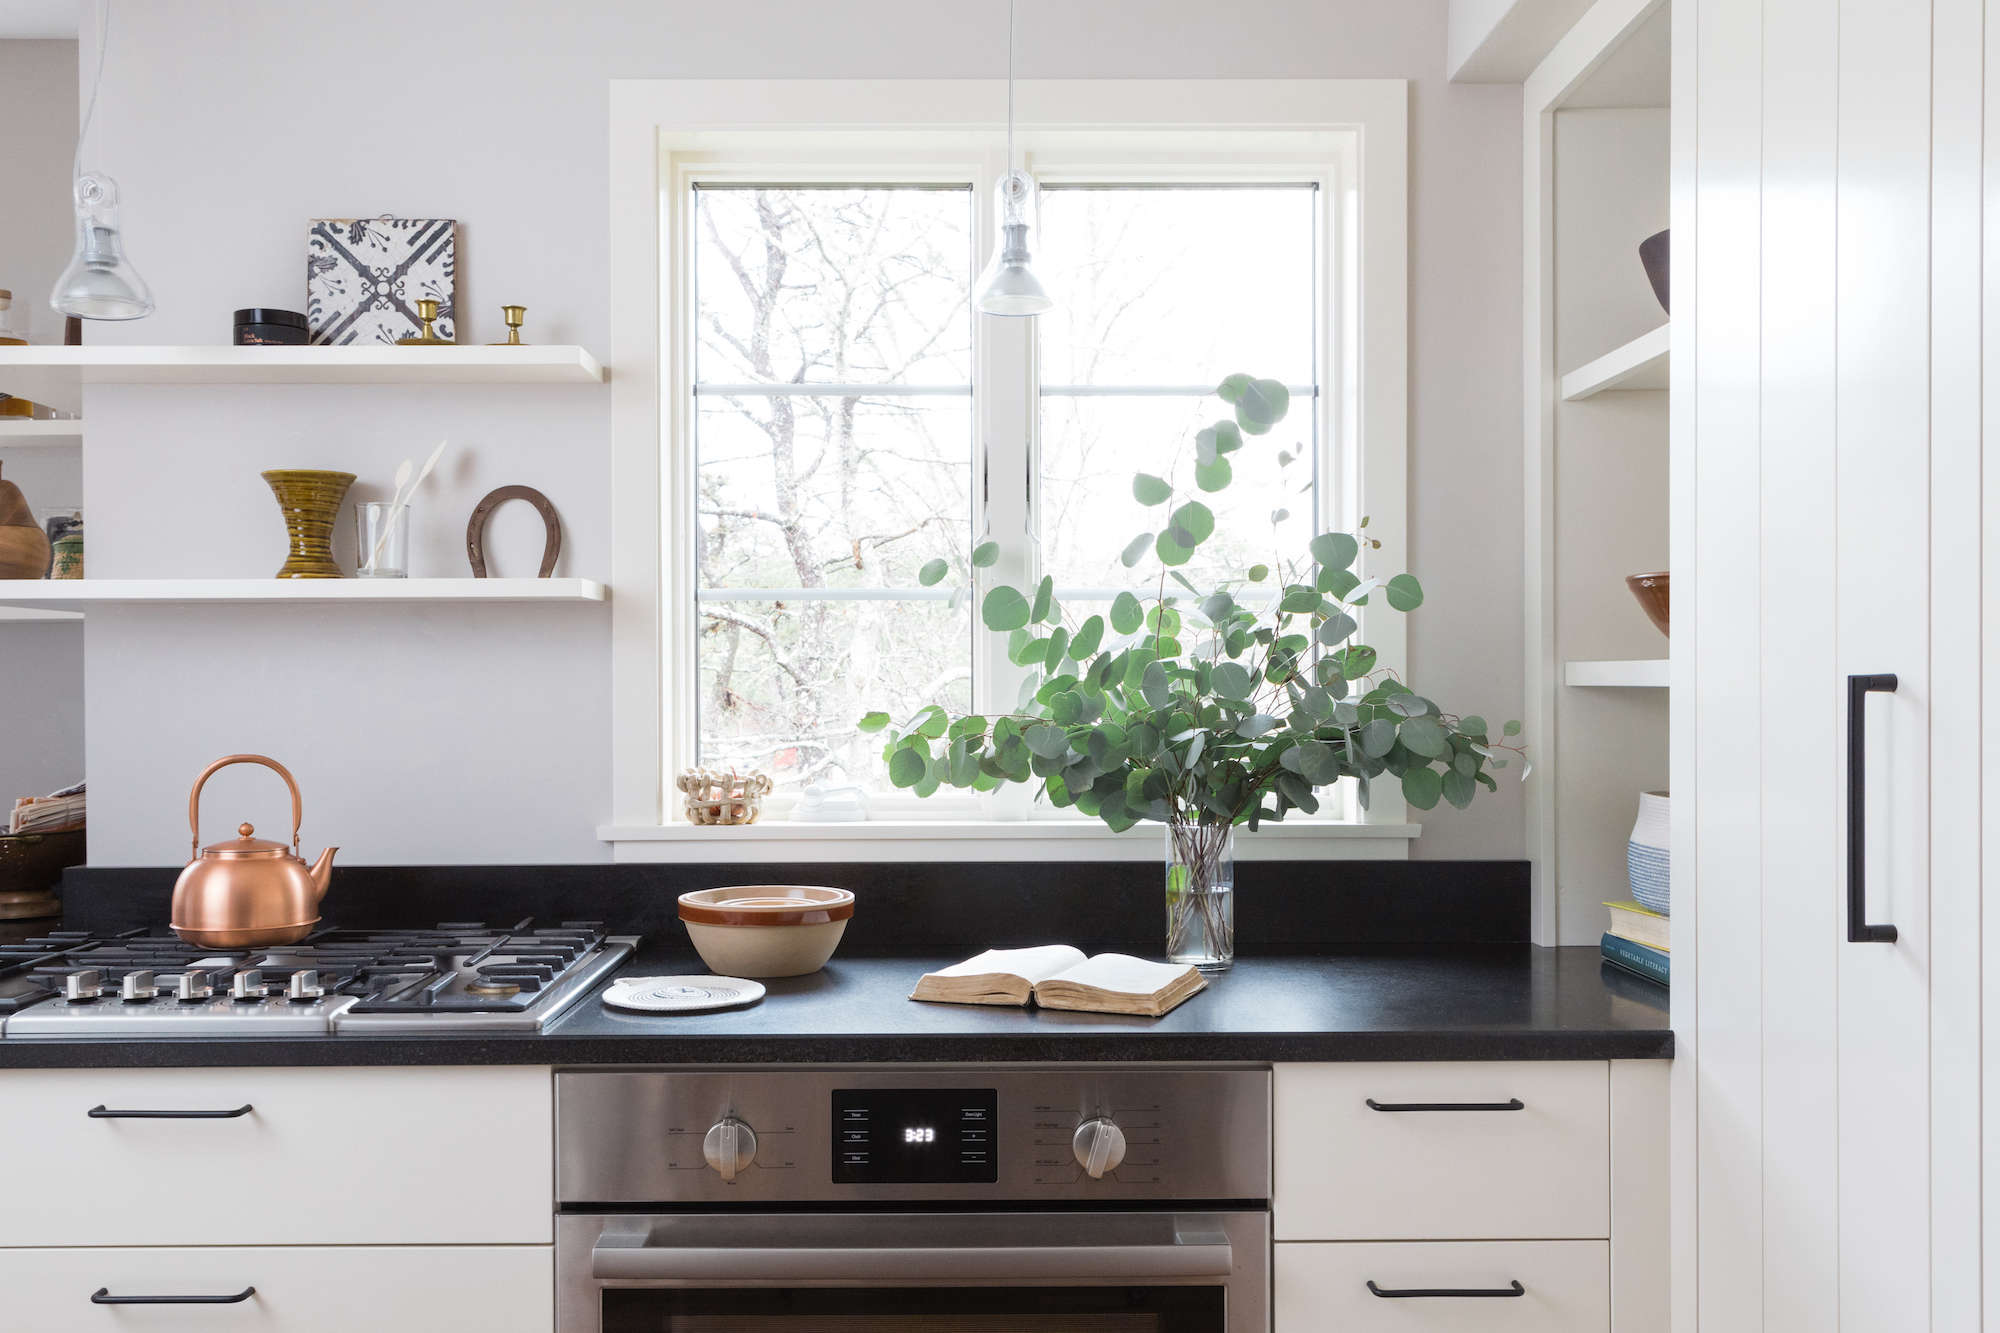 bosch kitchen suite utensil set an la bohemian style with home appliances